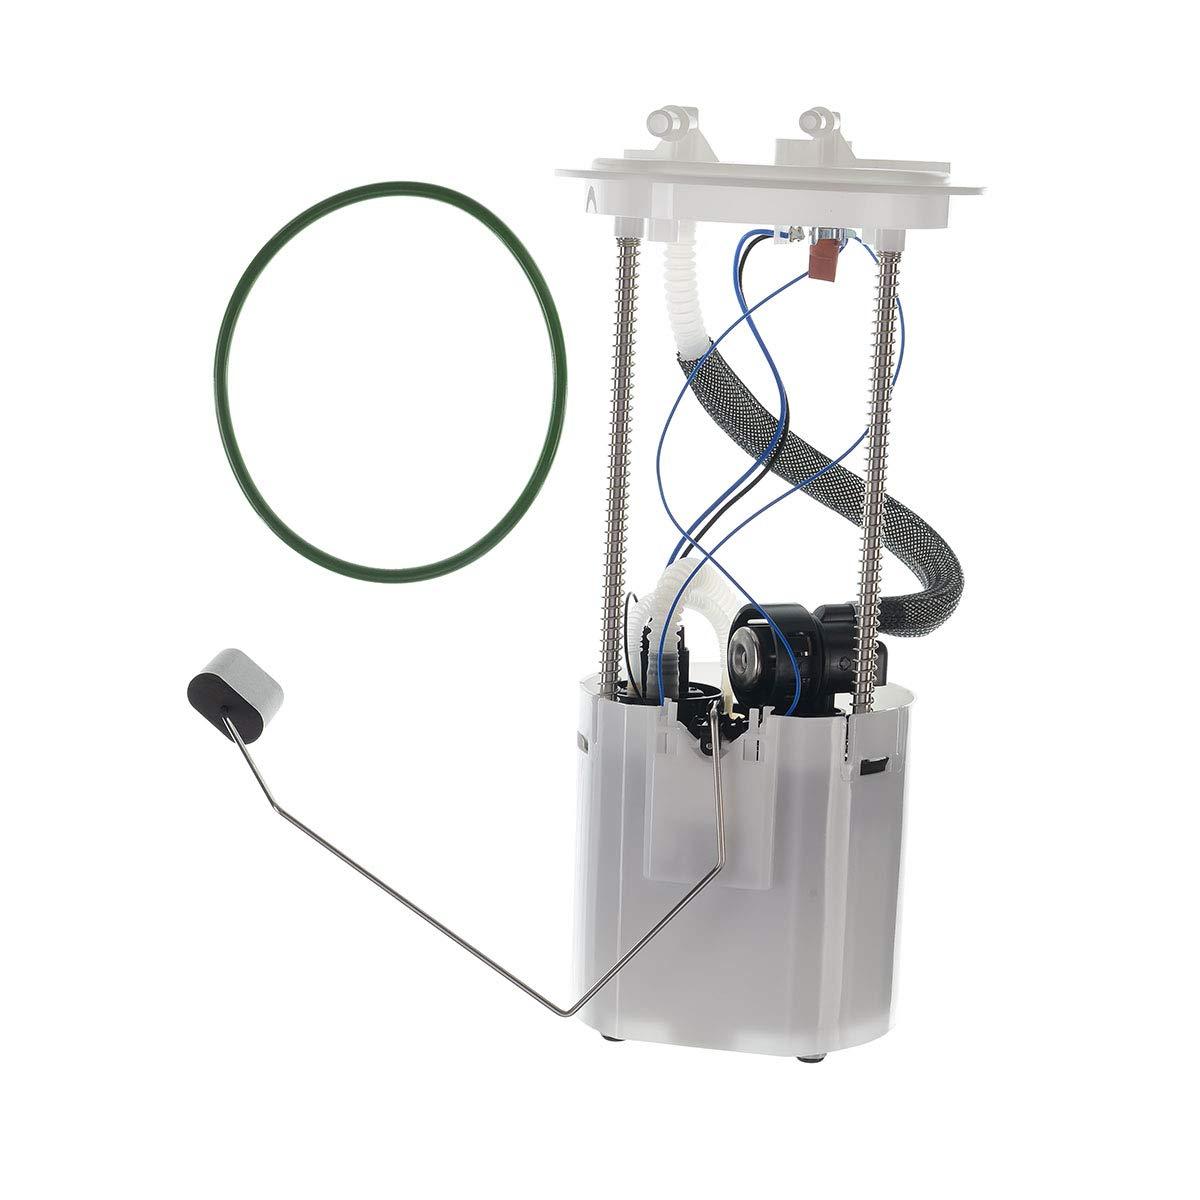 Motorcraft PFS-554 Electric Fuel Pump